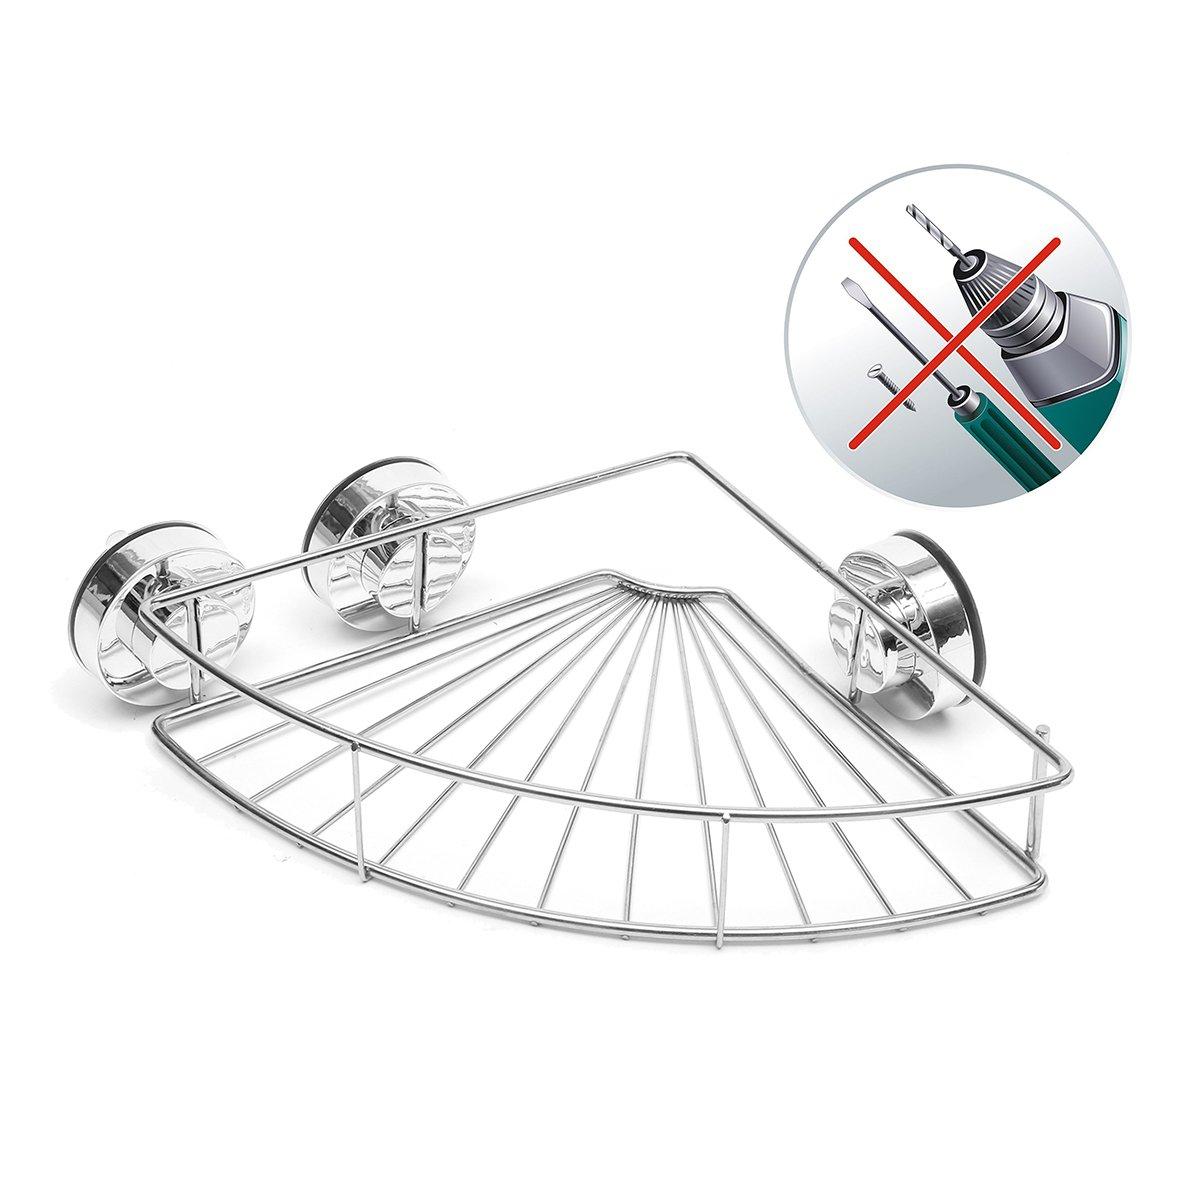 GEMITTO Bathroom Shelf, Wall Mounted 304 Stainless Steel Shower Shelf kitchen basket organizer, Vacuum Suction Cup Corner Shower Caddy (No Drilling) GEMITTOOHBUS3567812112